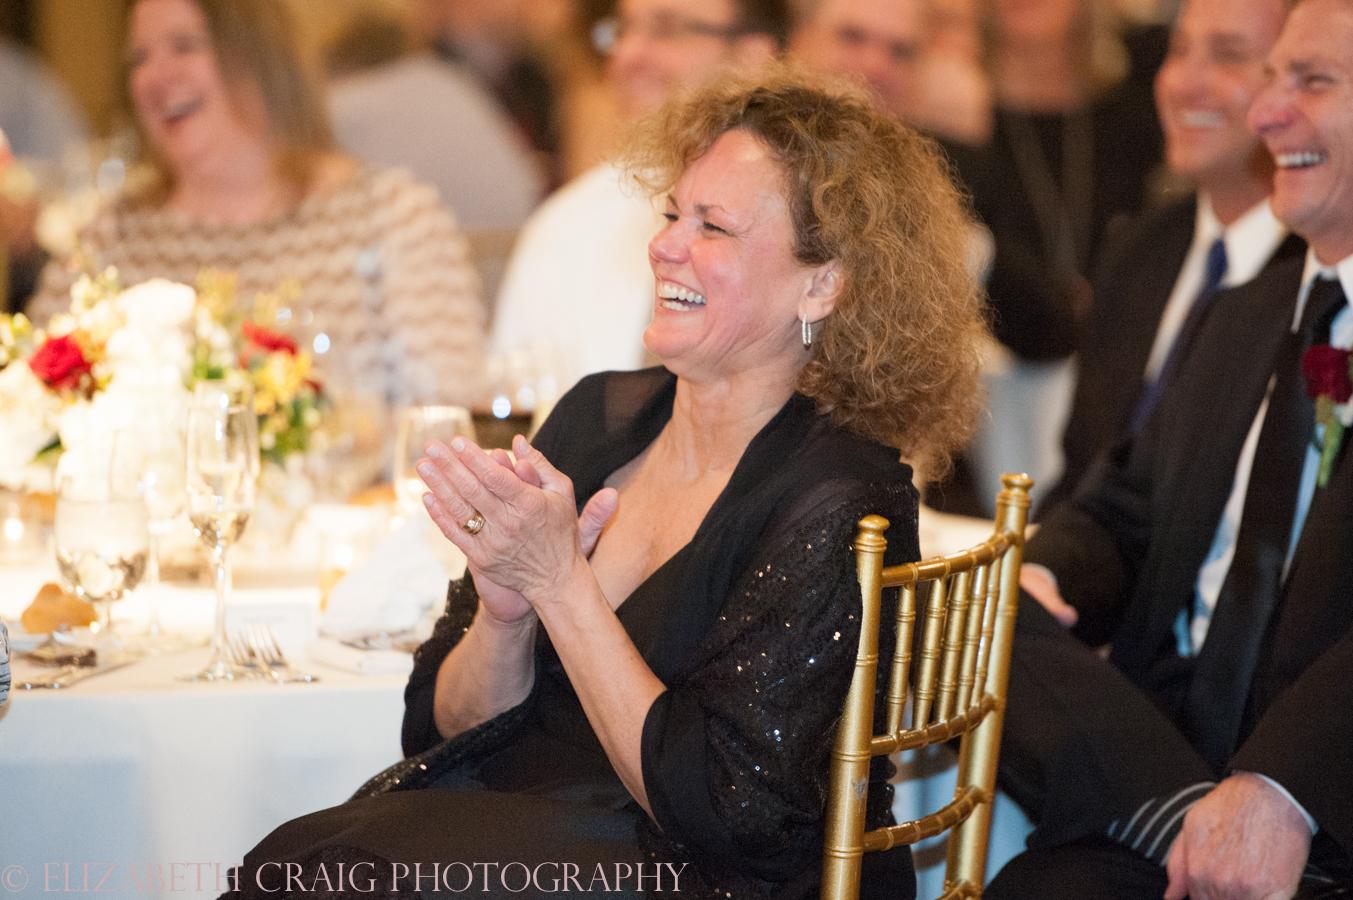 Carnegie Museum of Art Weddings | Elizabeth Craig Photography-0120